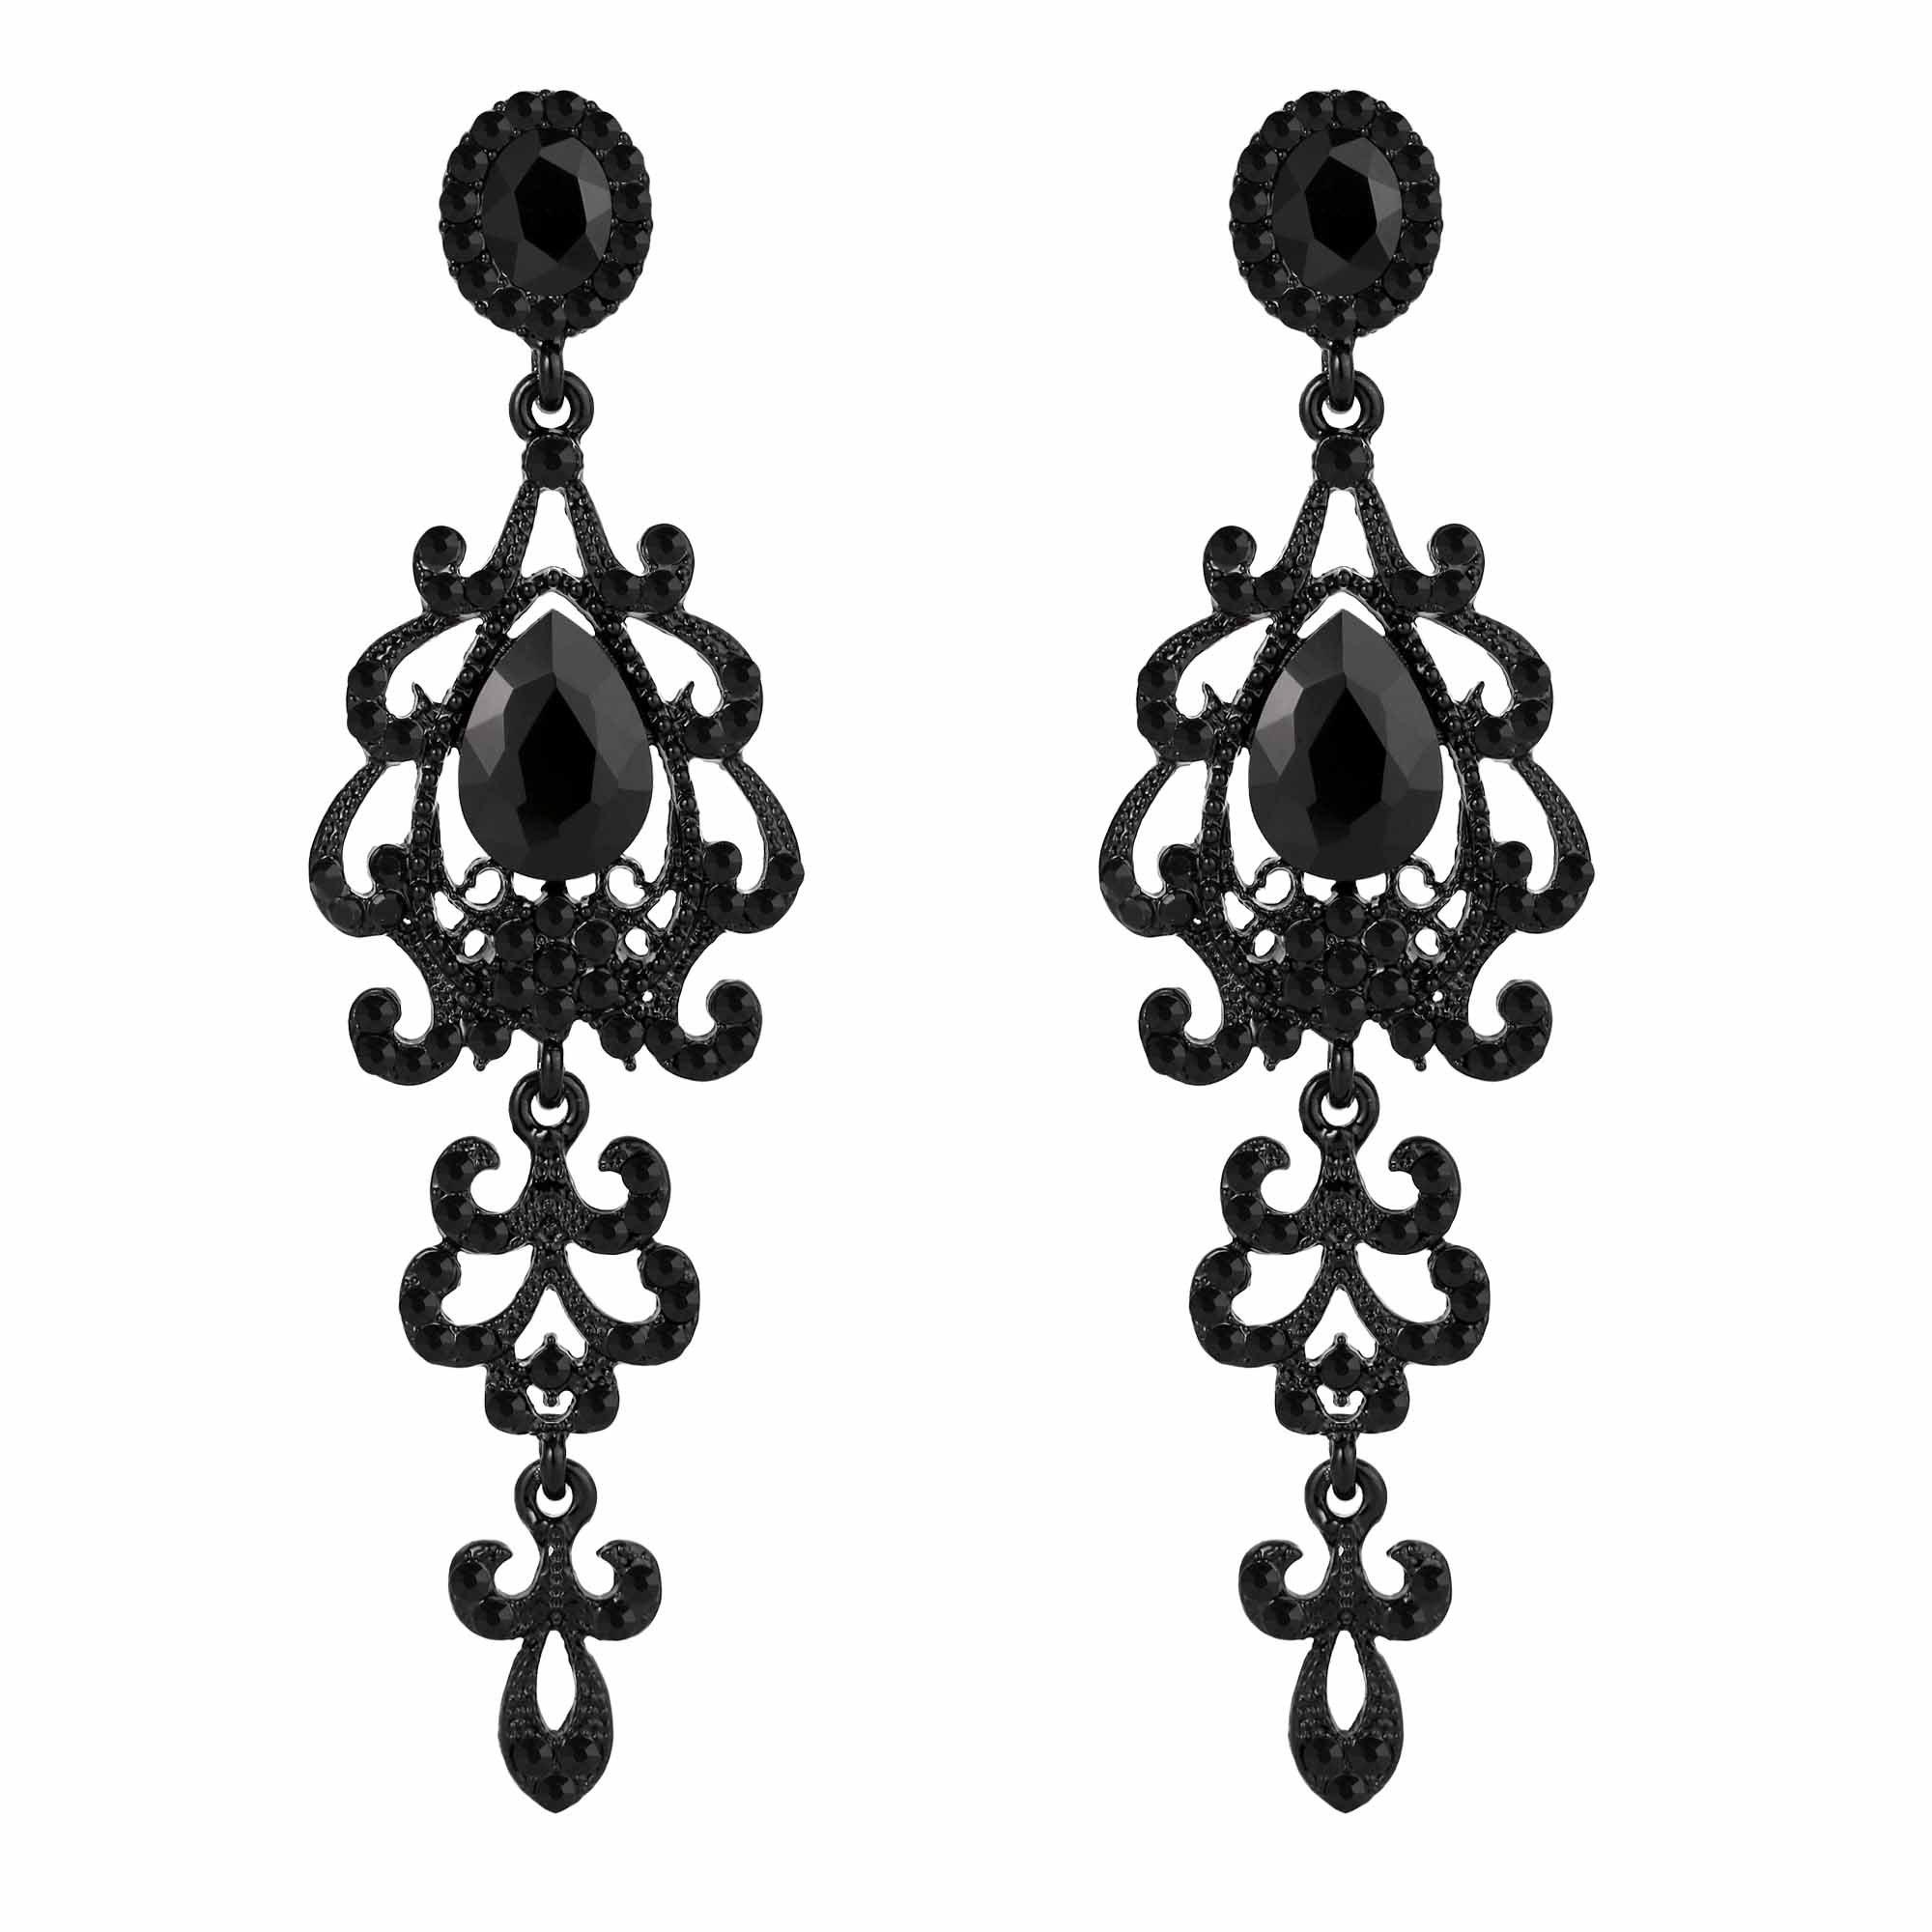 BriLove Women's Wedding Bridal Dangle Earrings with Victorian Style Crystal Teardrop Chandelier Black Black-Silver-Tone by BriLove (Image #1)